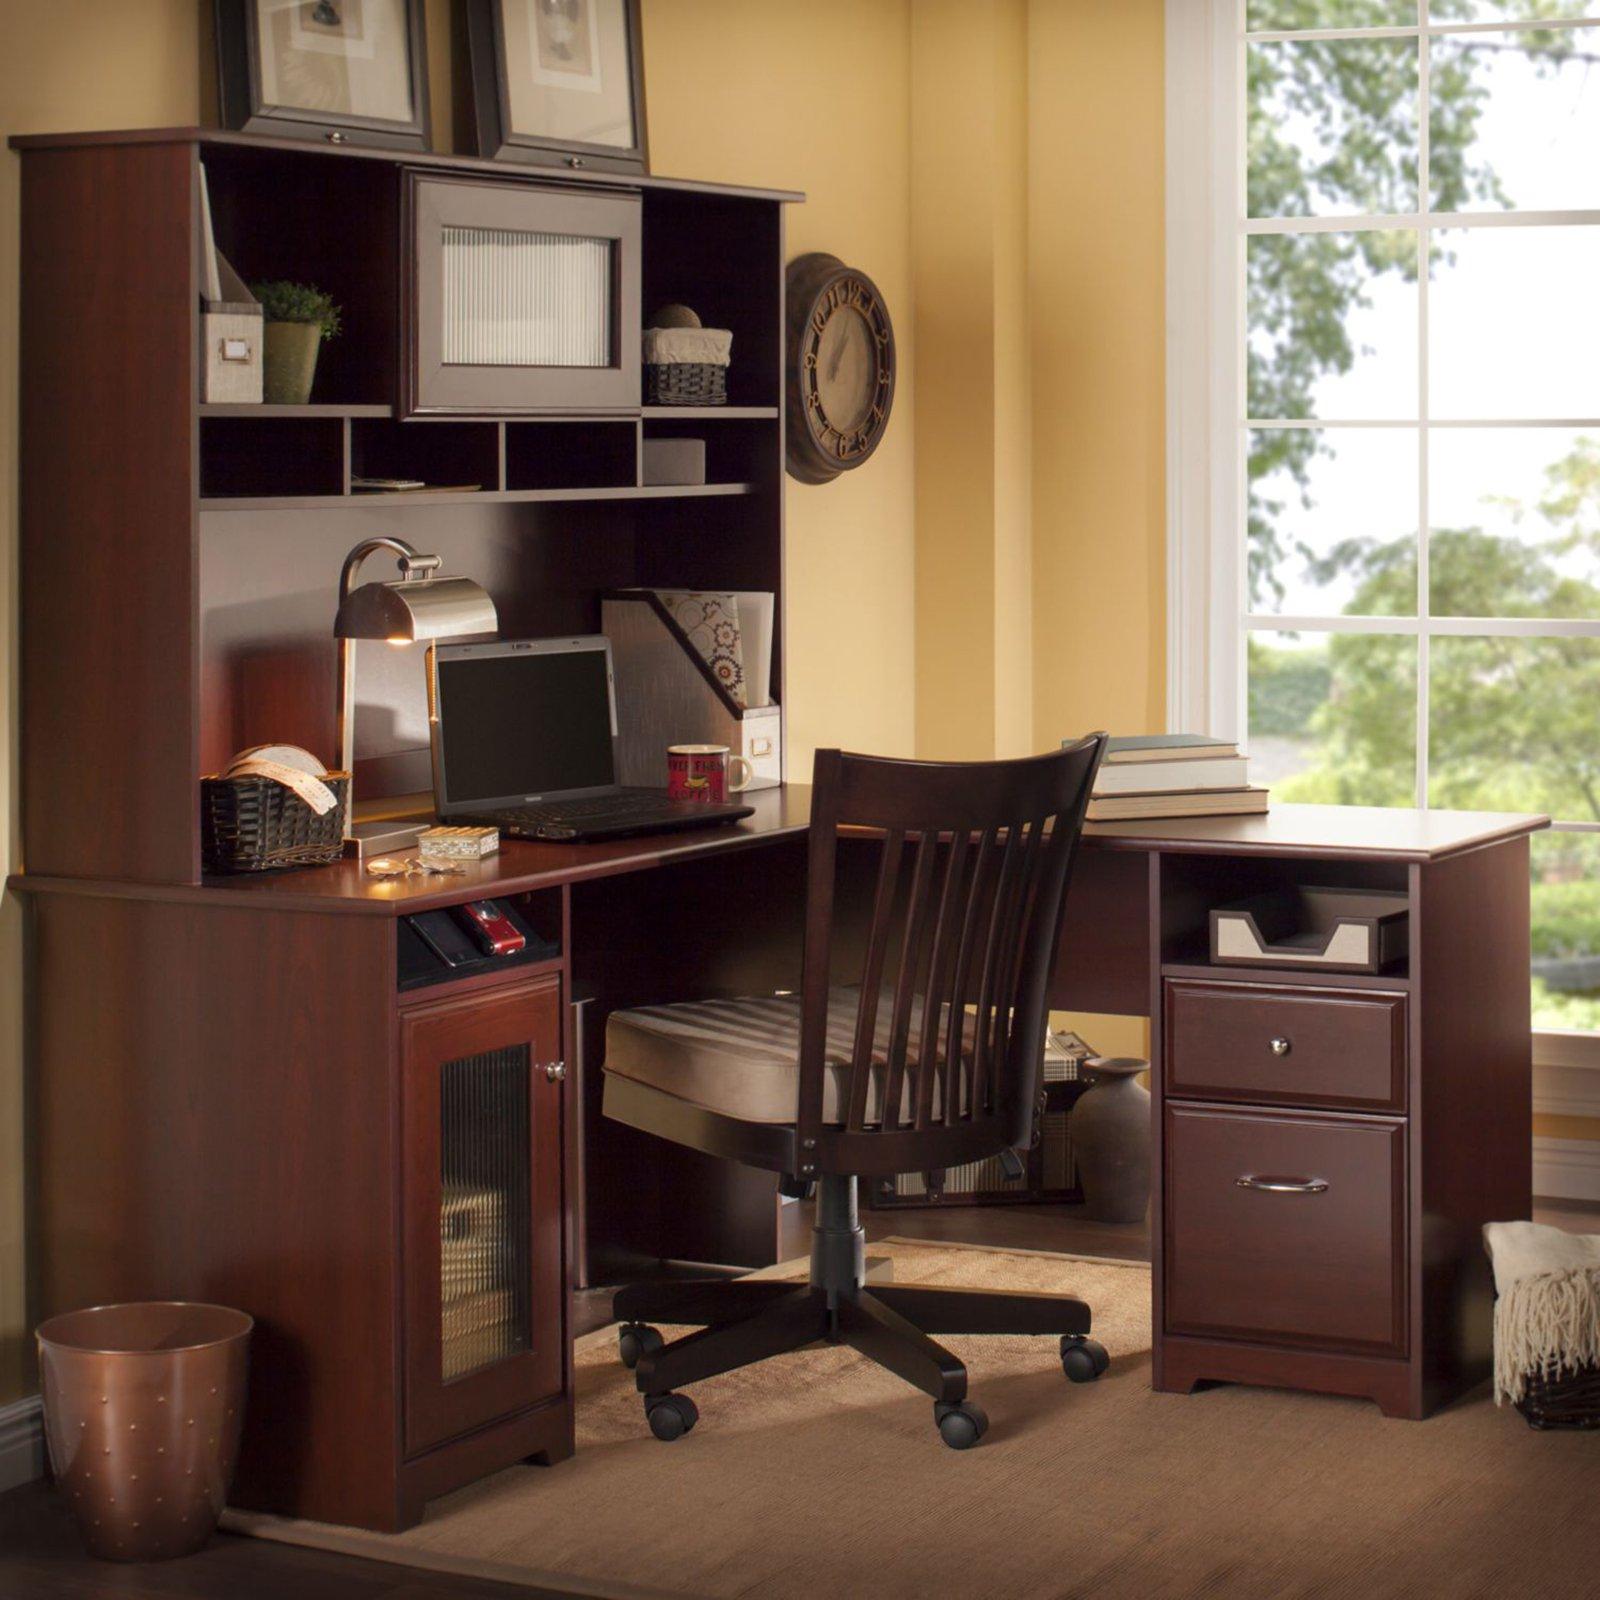 Bush Furniture Cabot 60 In L Shaped Desk With Hutch